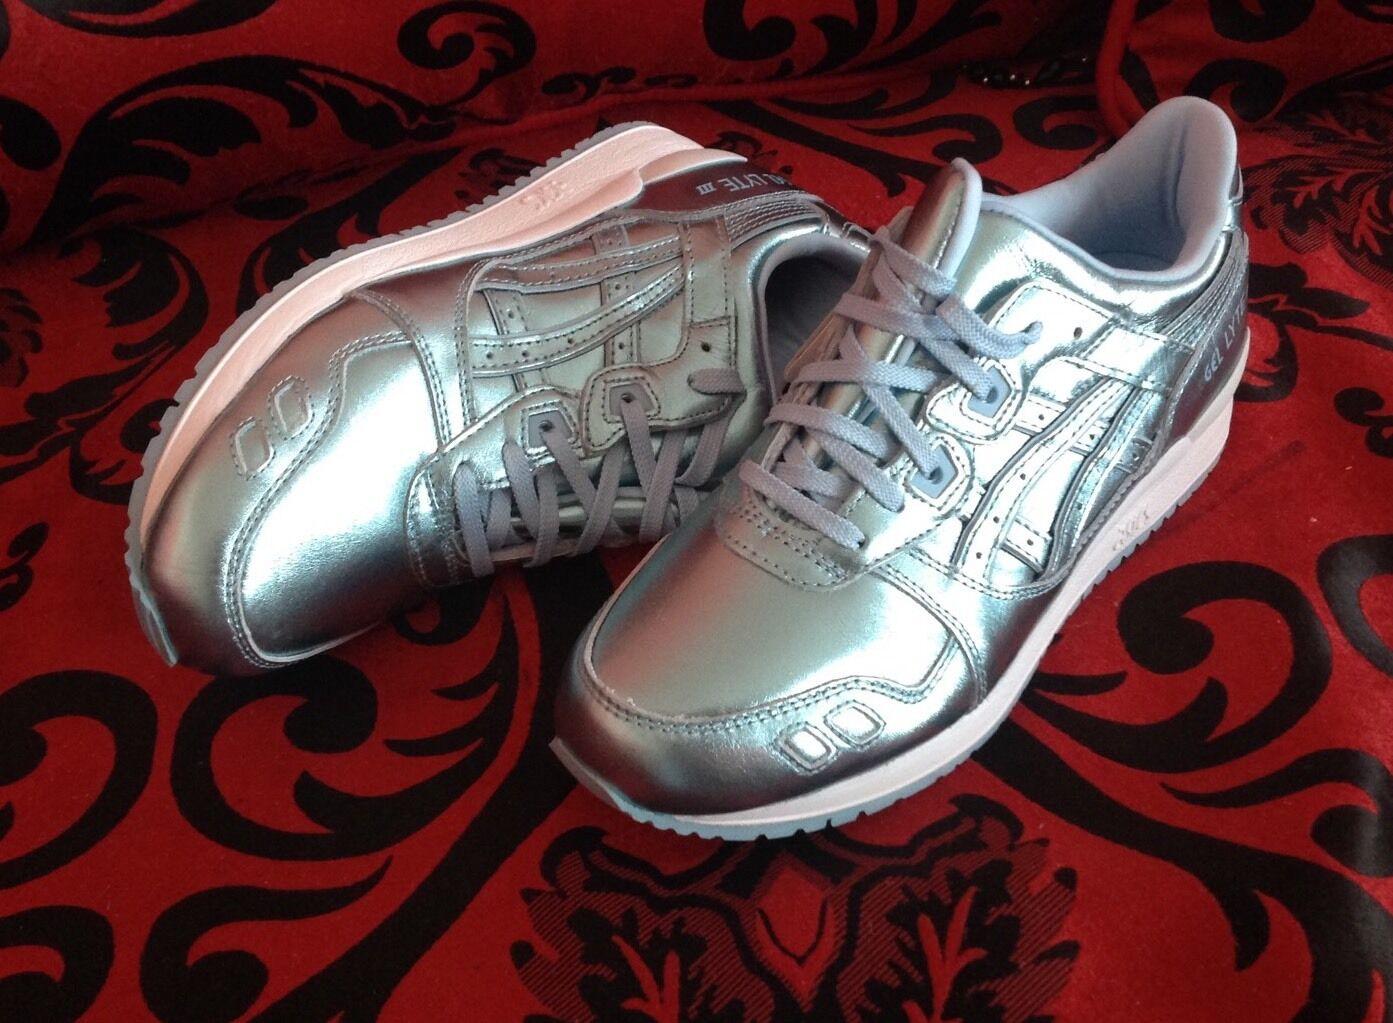 ASICS GEL LYTE III H6E5K 4444 Damenschuhe Schuhe ICE Blau 100% AUTHENTIC